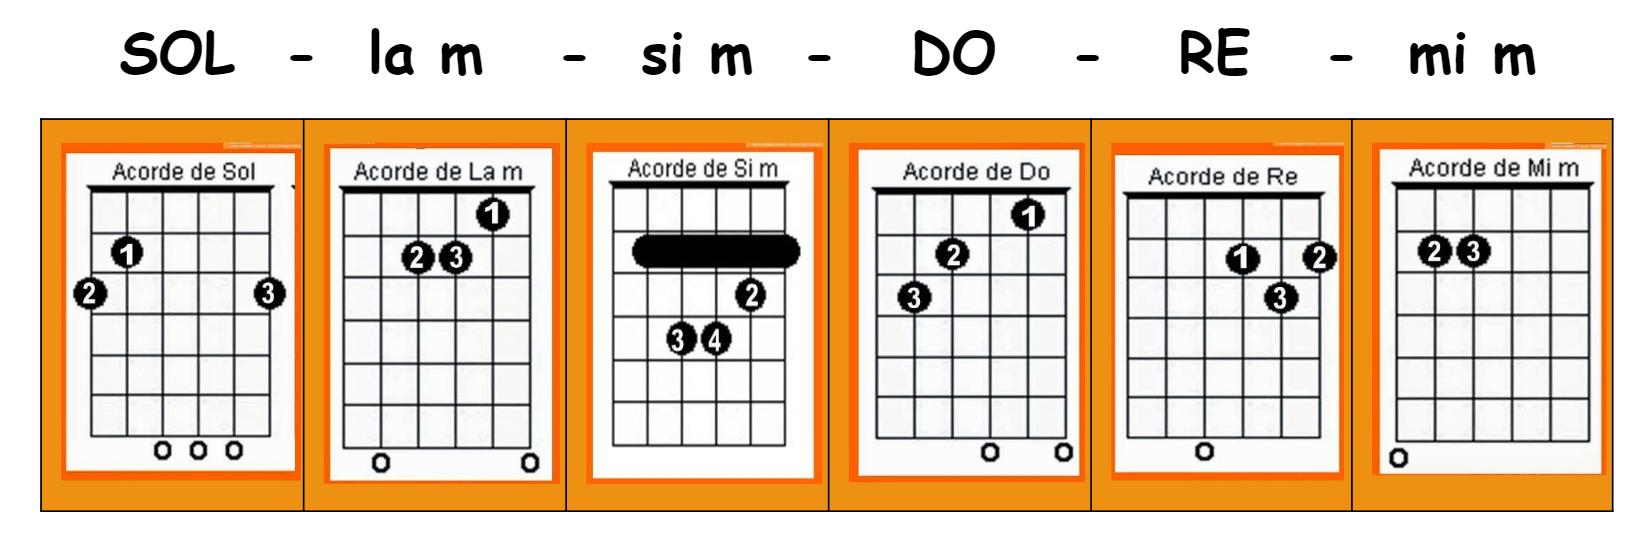 11-126 SOL-lam-sim-DO-RE-mim